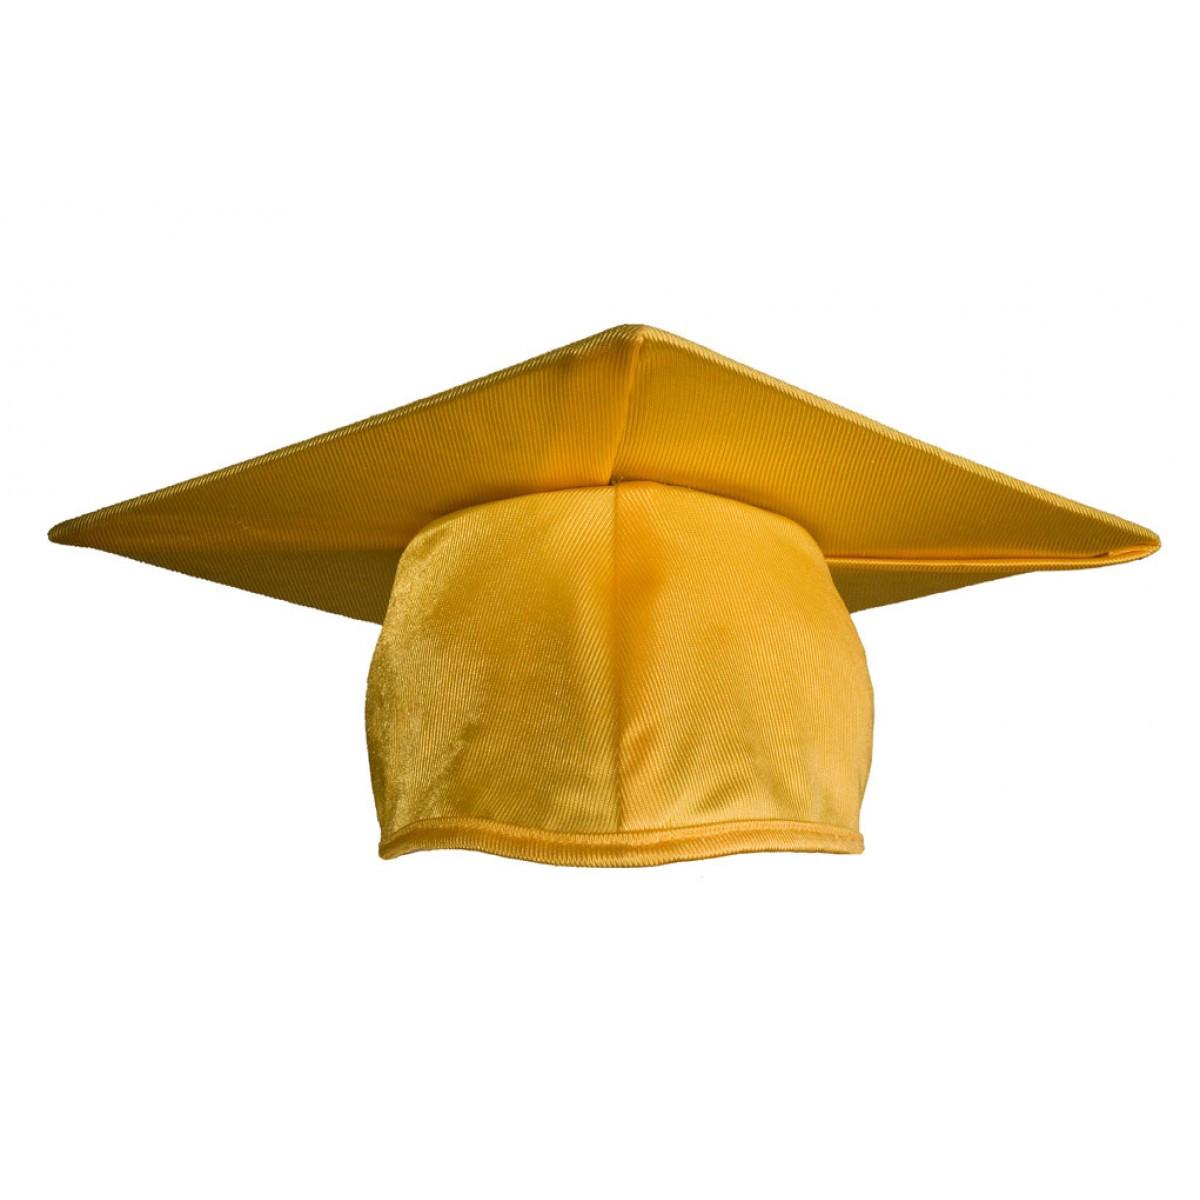 Shiny Gold Cap Gown Tassel Cool School Studios